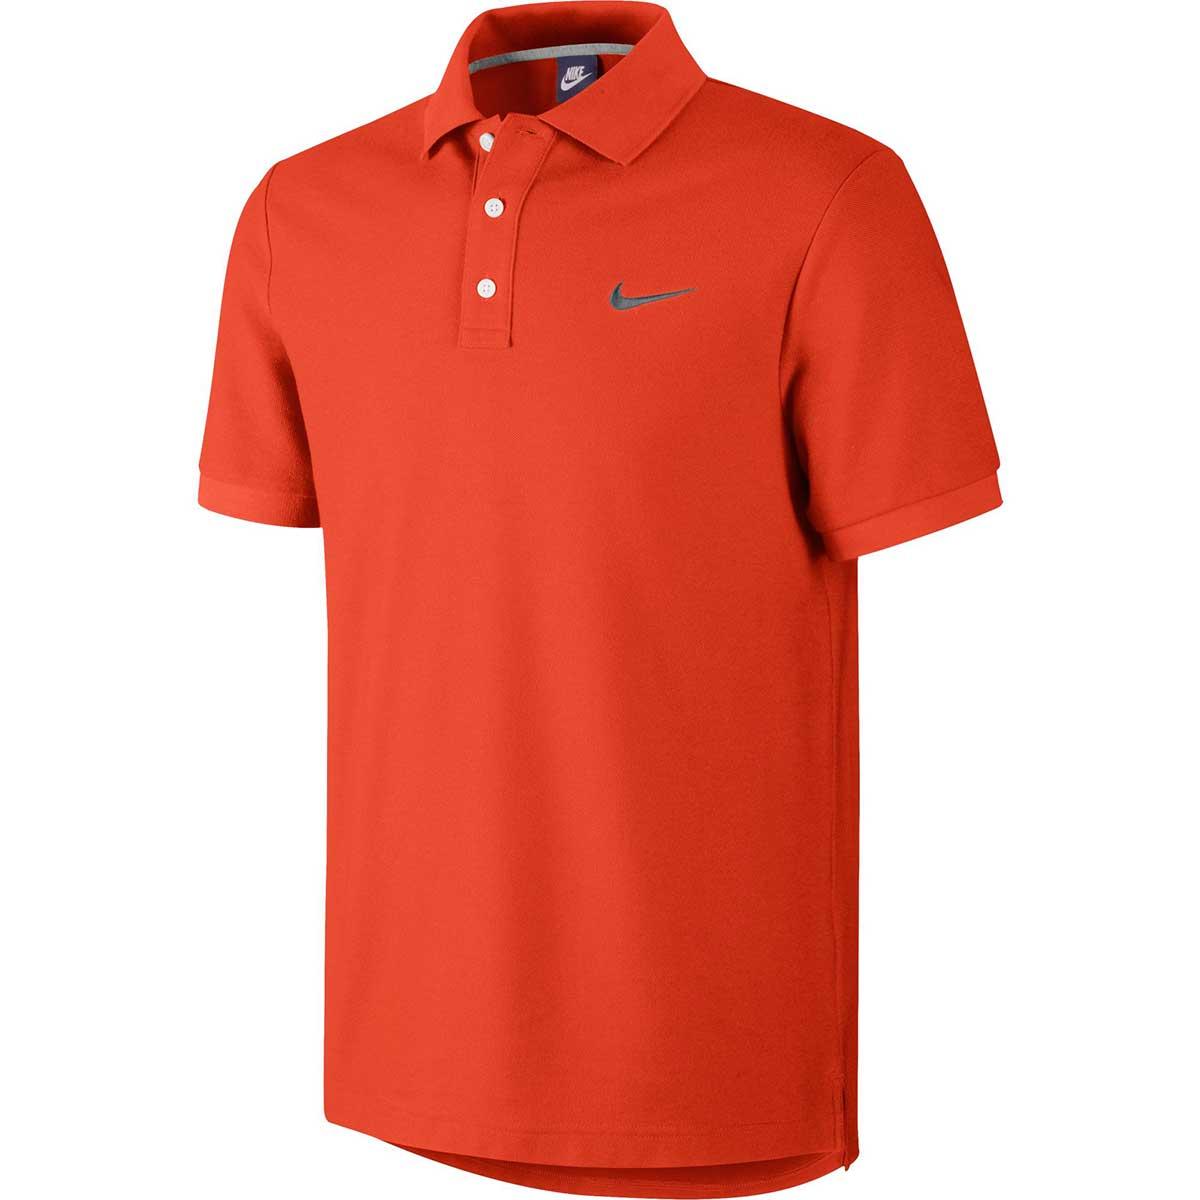 Buy Nike Men s Cotton Polo (Orange) Online in India 62179ef19